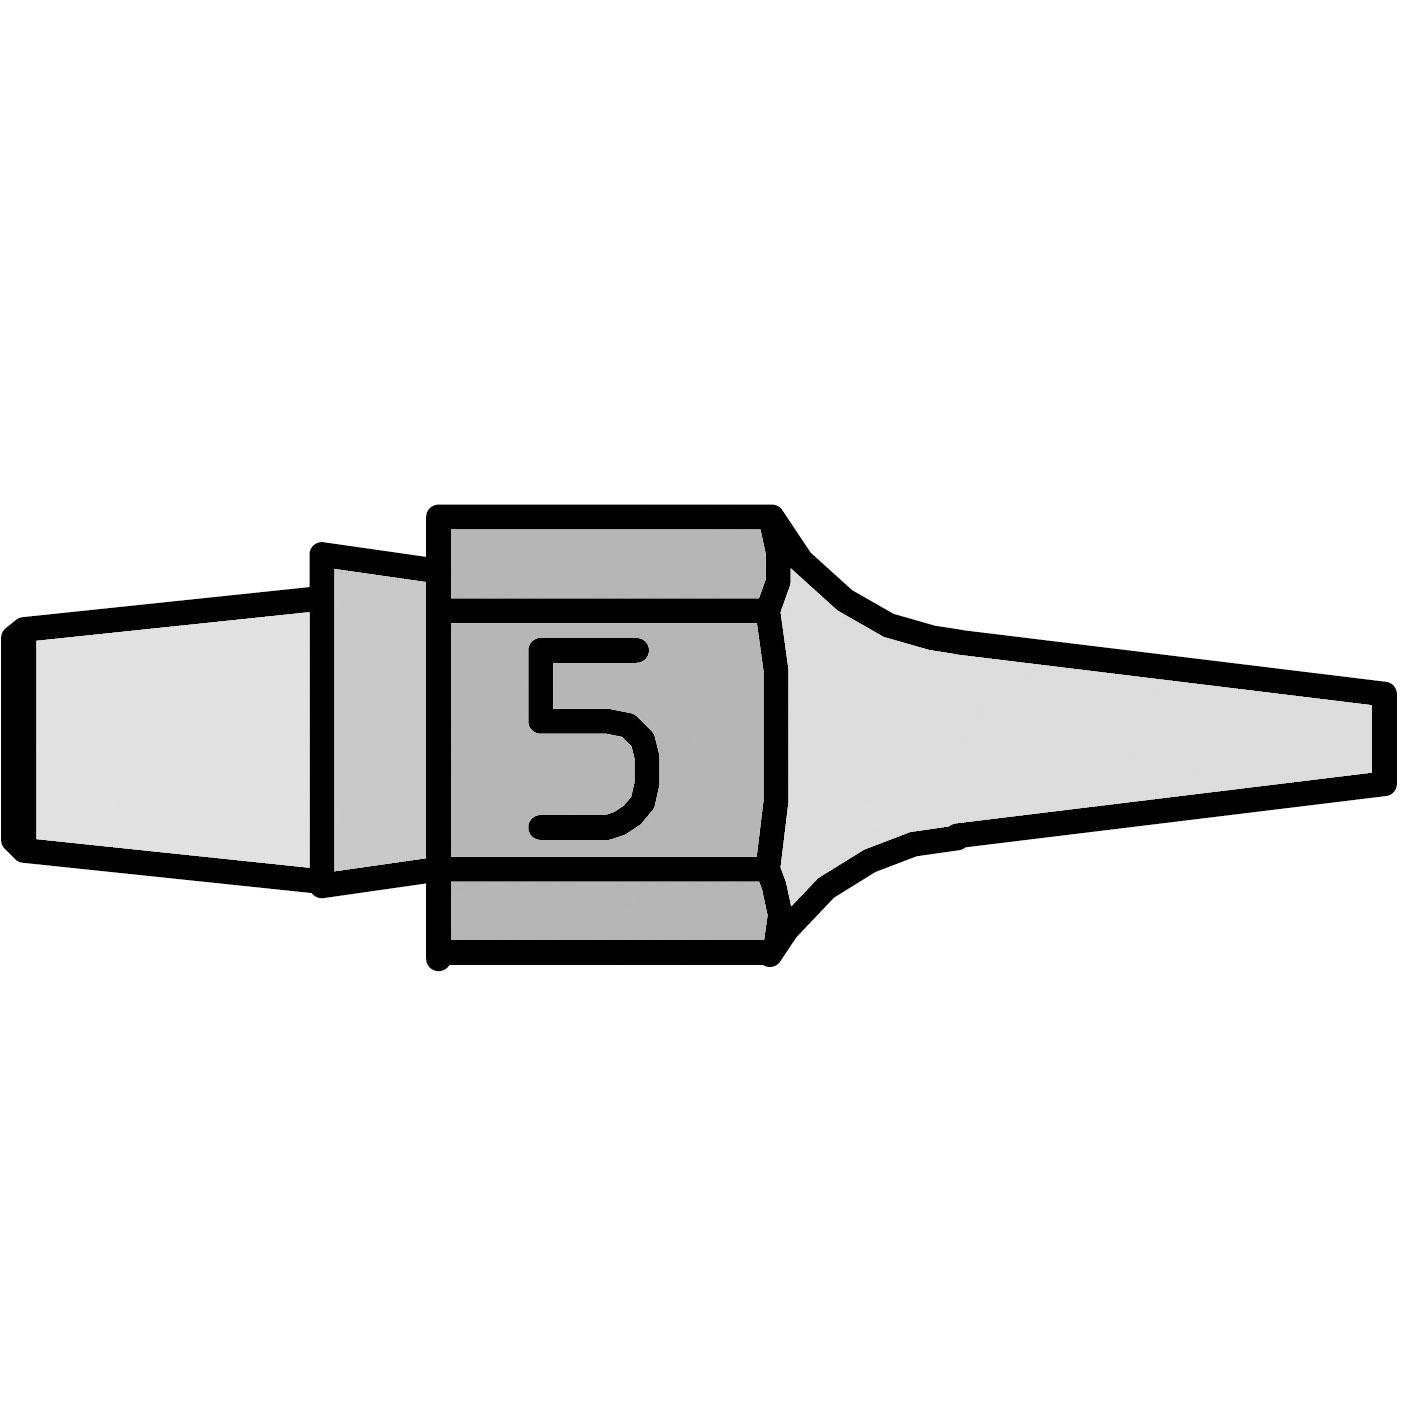 DX 115 Desoldering Nozzle